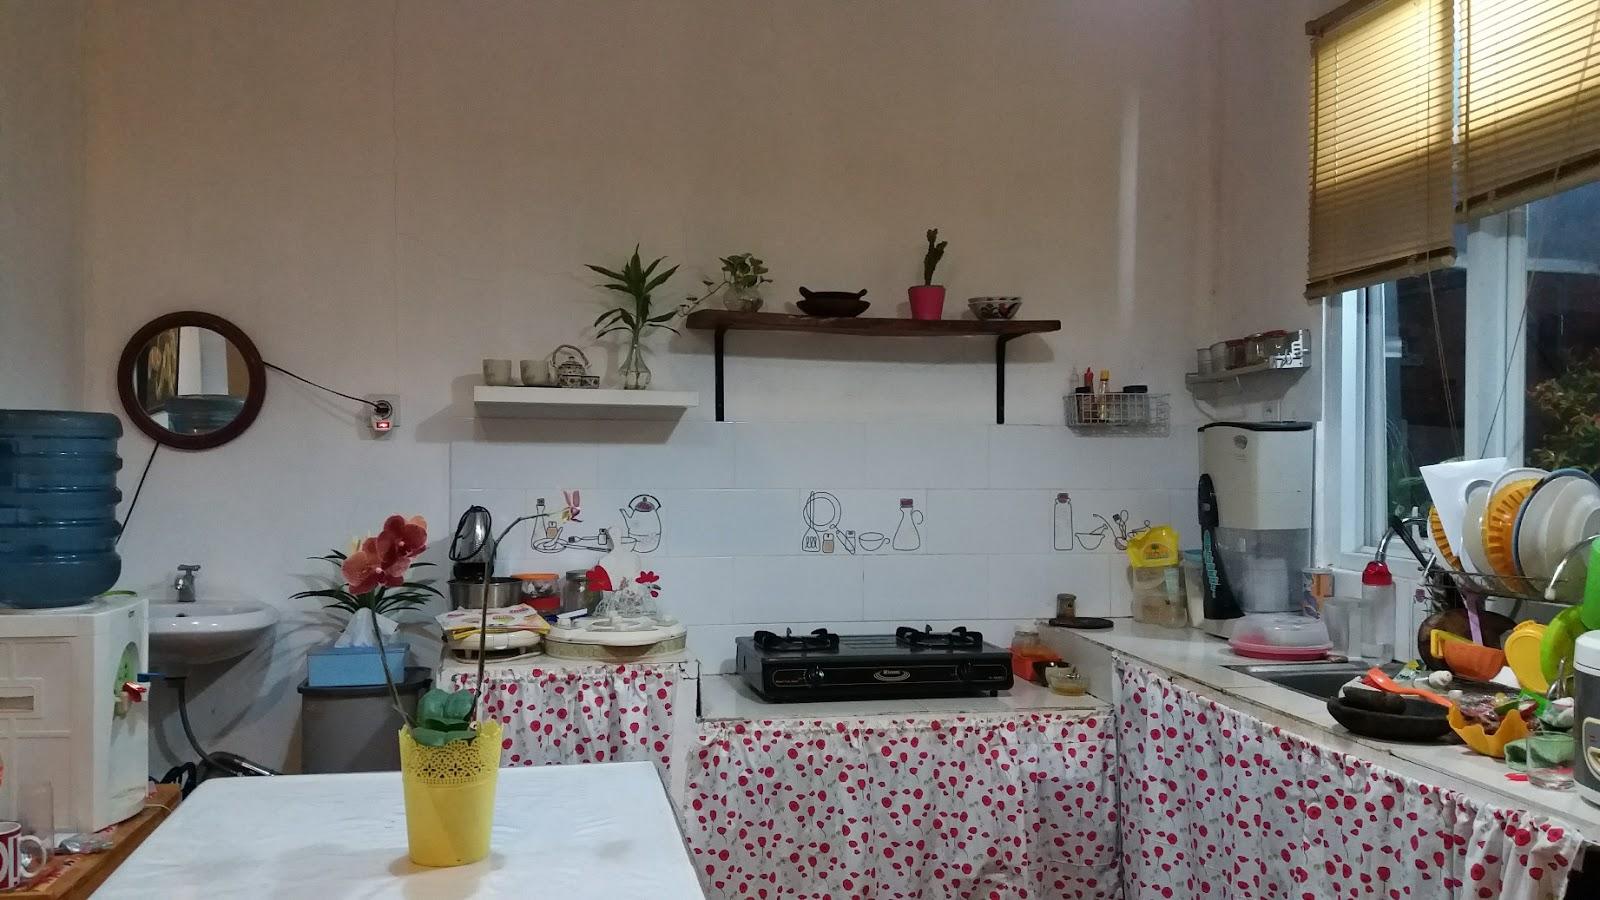 Home Living Diy Membuat Gorden Kolong Dapur Rina Susanti S Blog